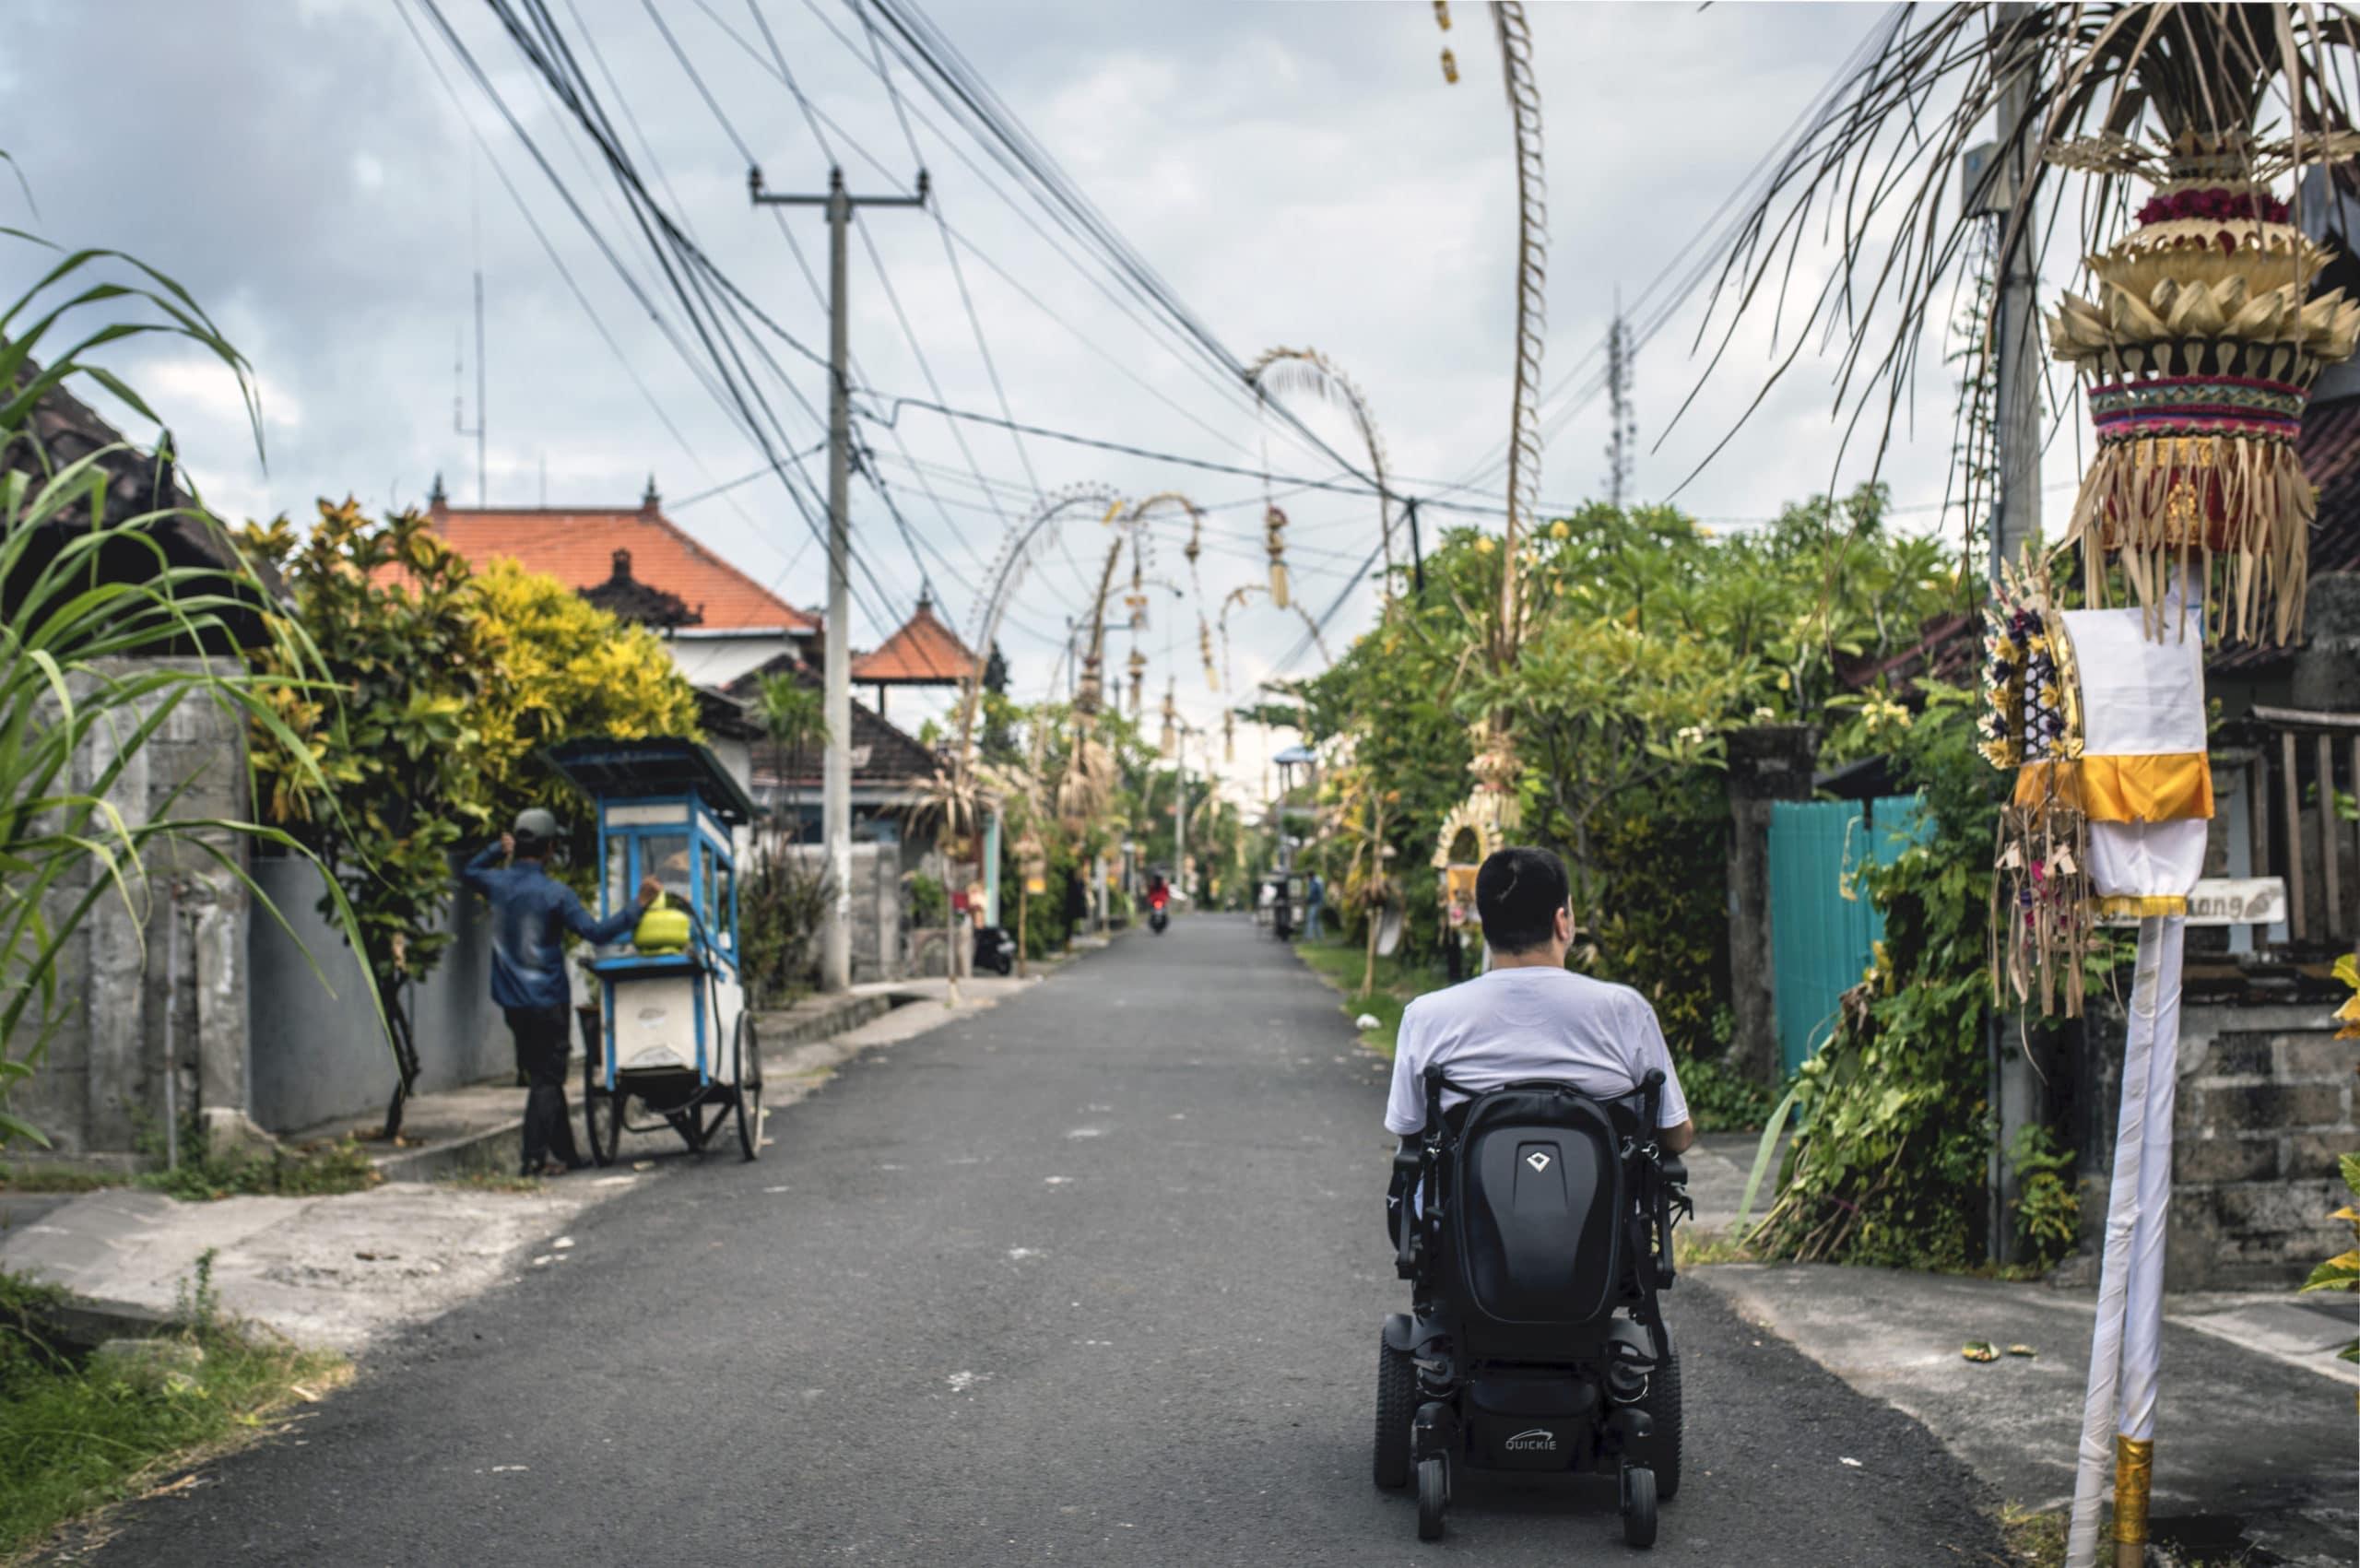 Minna riding down a street in Bali in his wheelchair